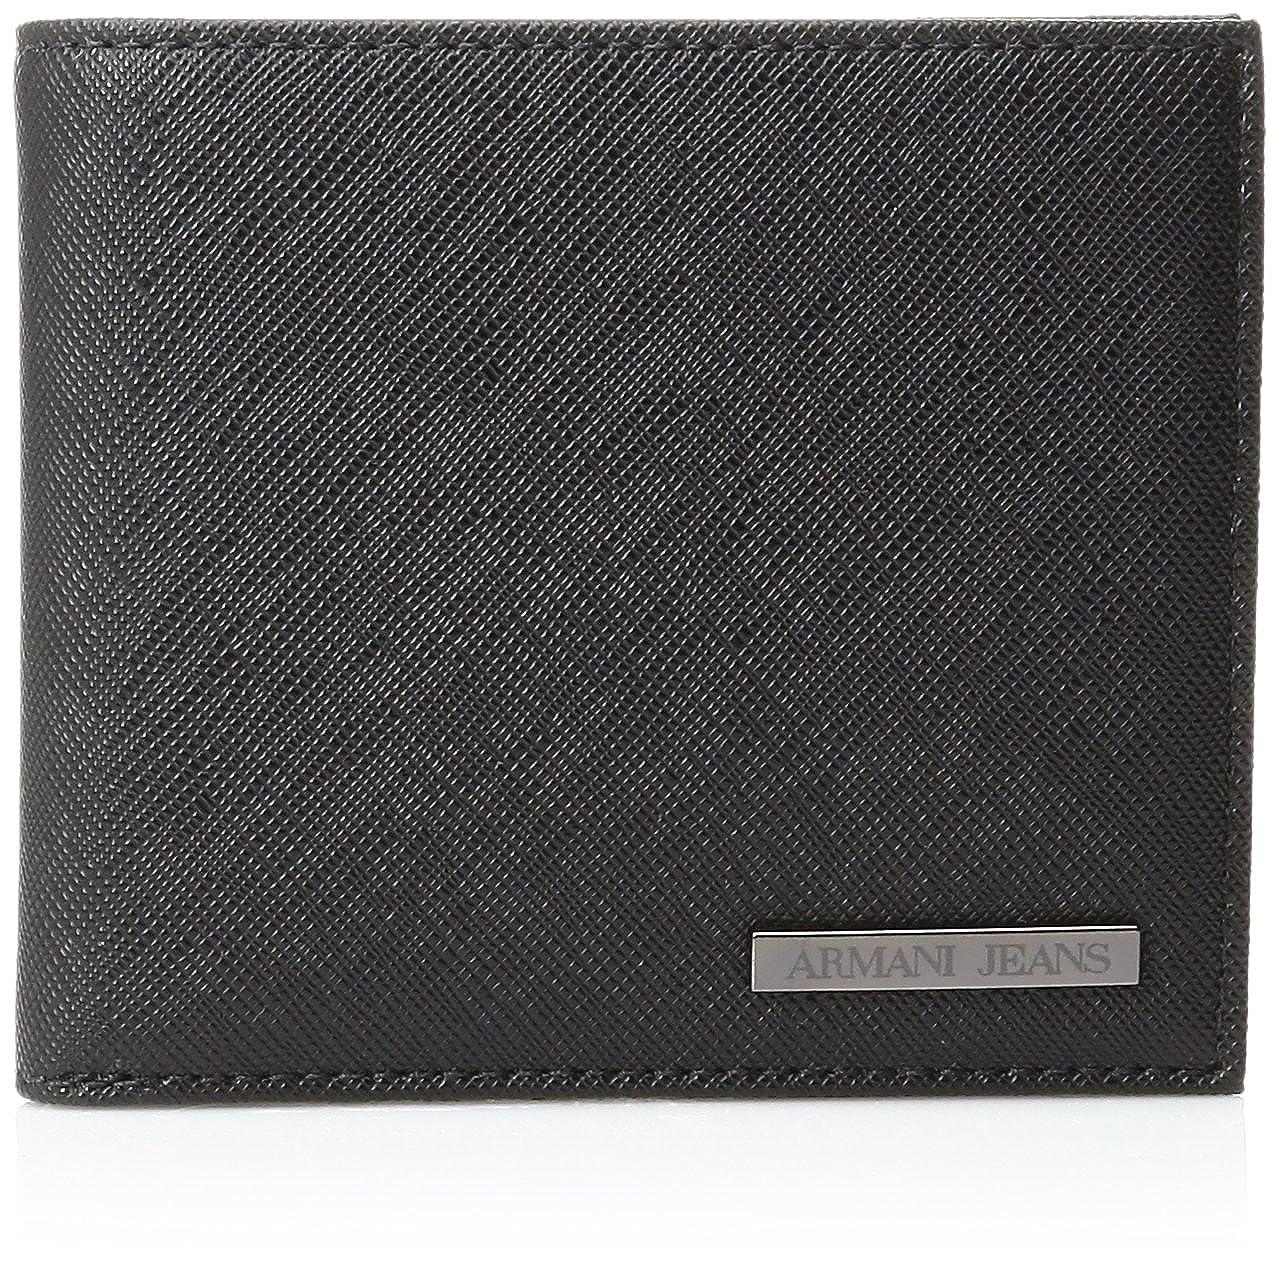 Armani Jeans Men's Saffiano Embossed Bi-Fold Wallet Black One Size 938541-CC991